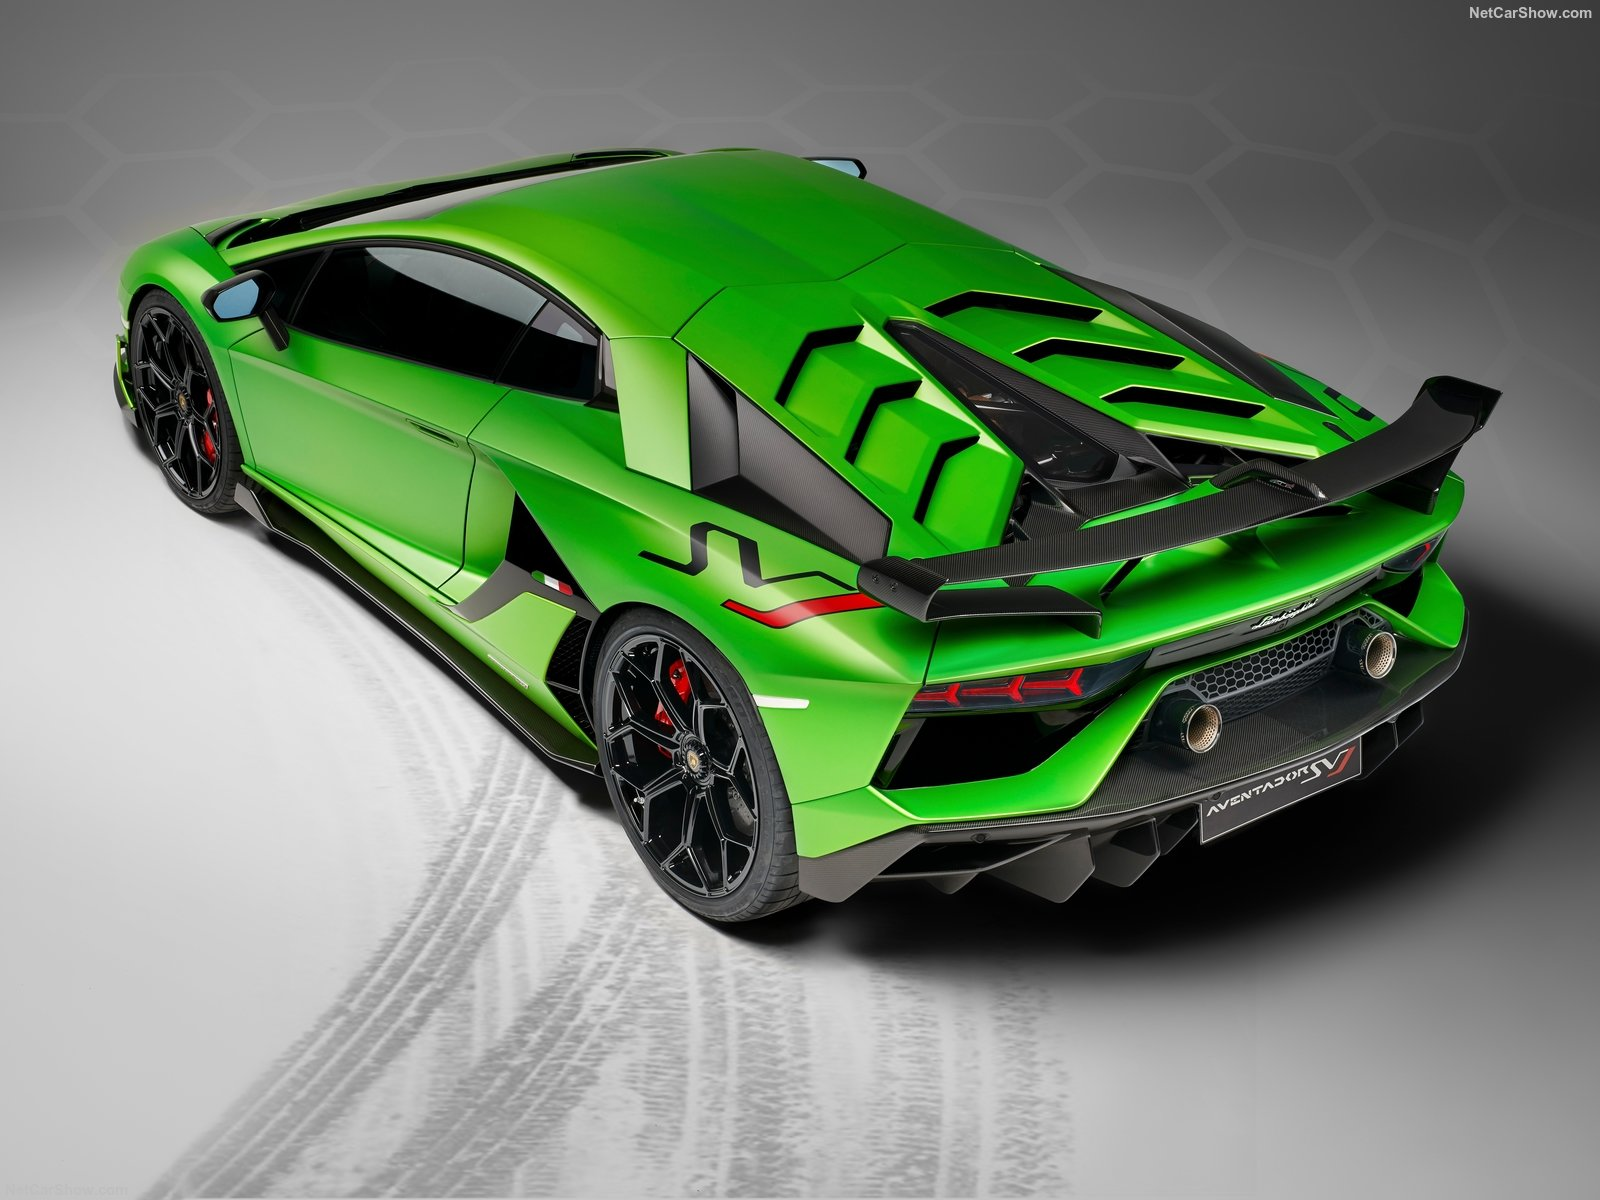 Lamborghini-Aventador_SVJ-2019-1600-0d